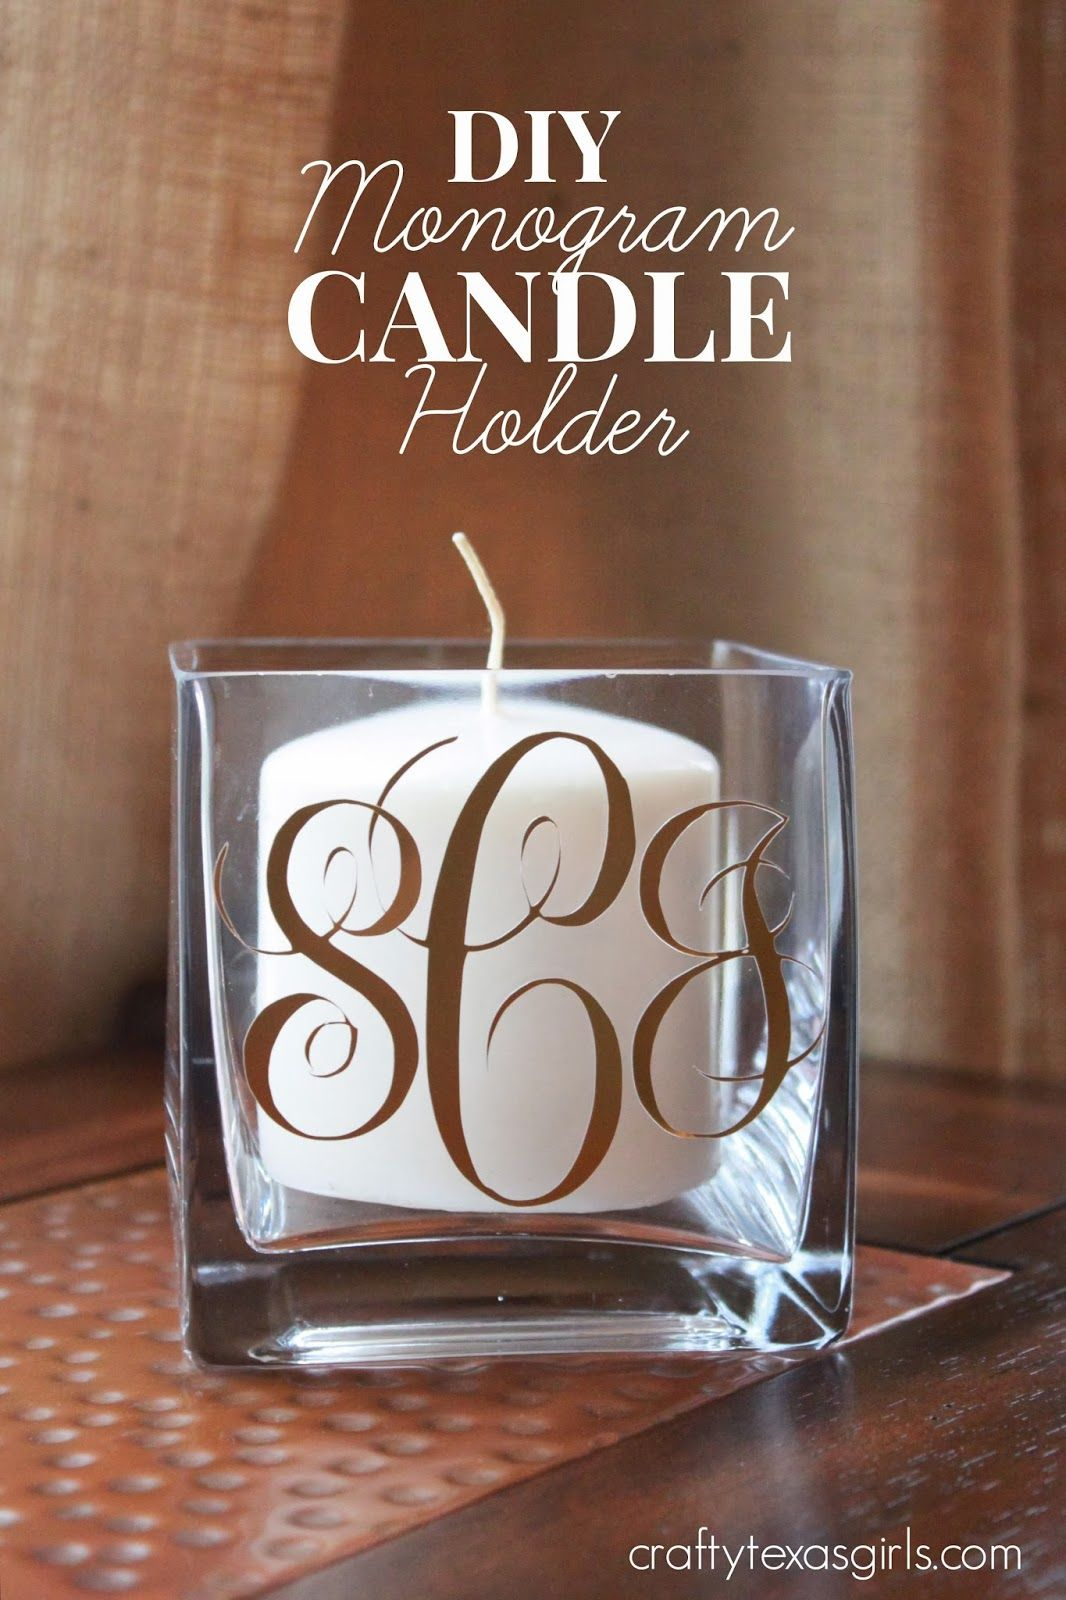 Crafty Texas Girls DIY Monogram Candle Holder created